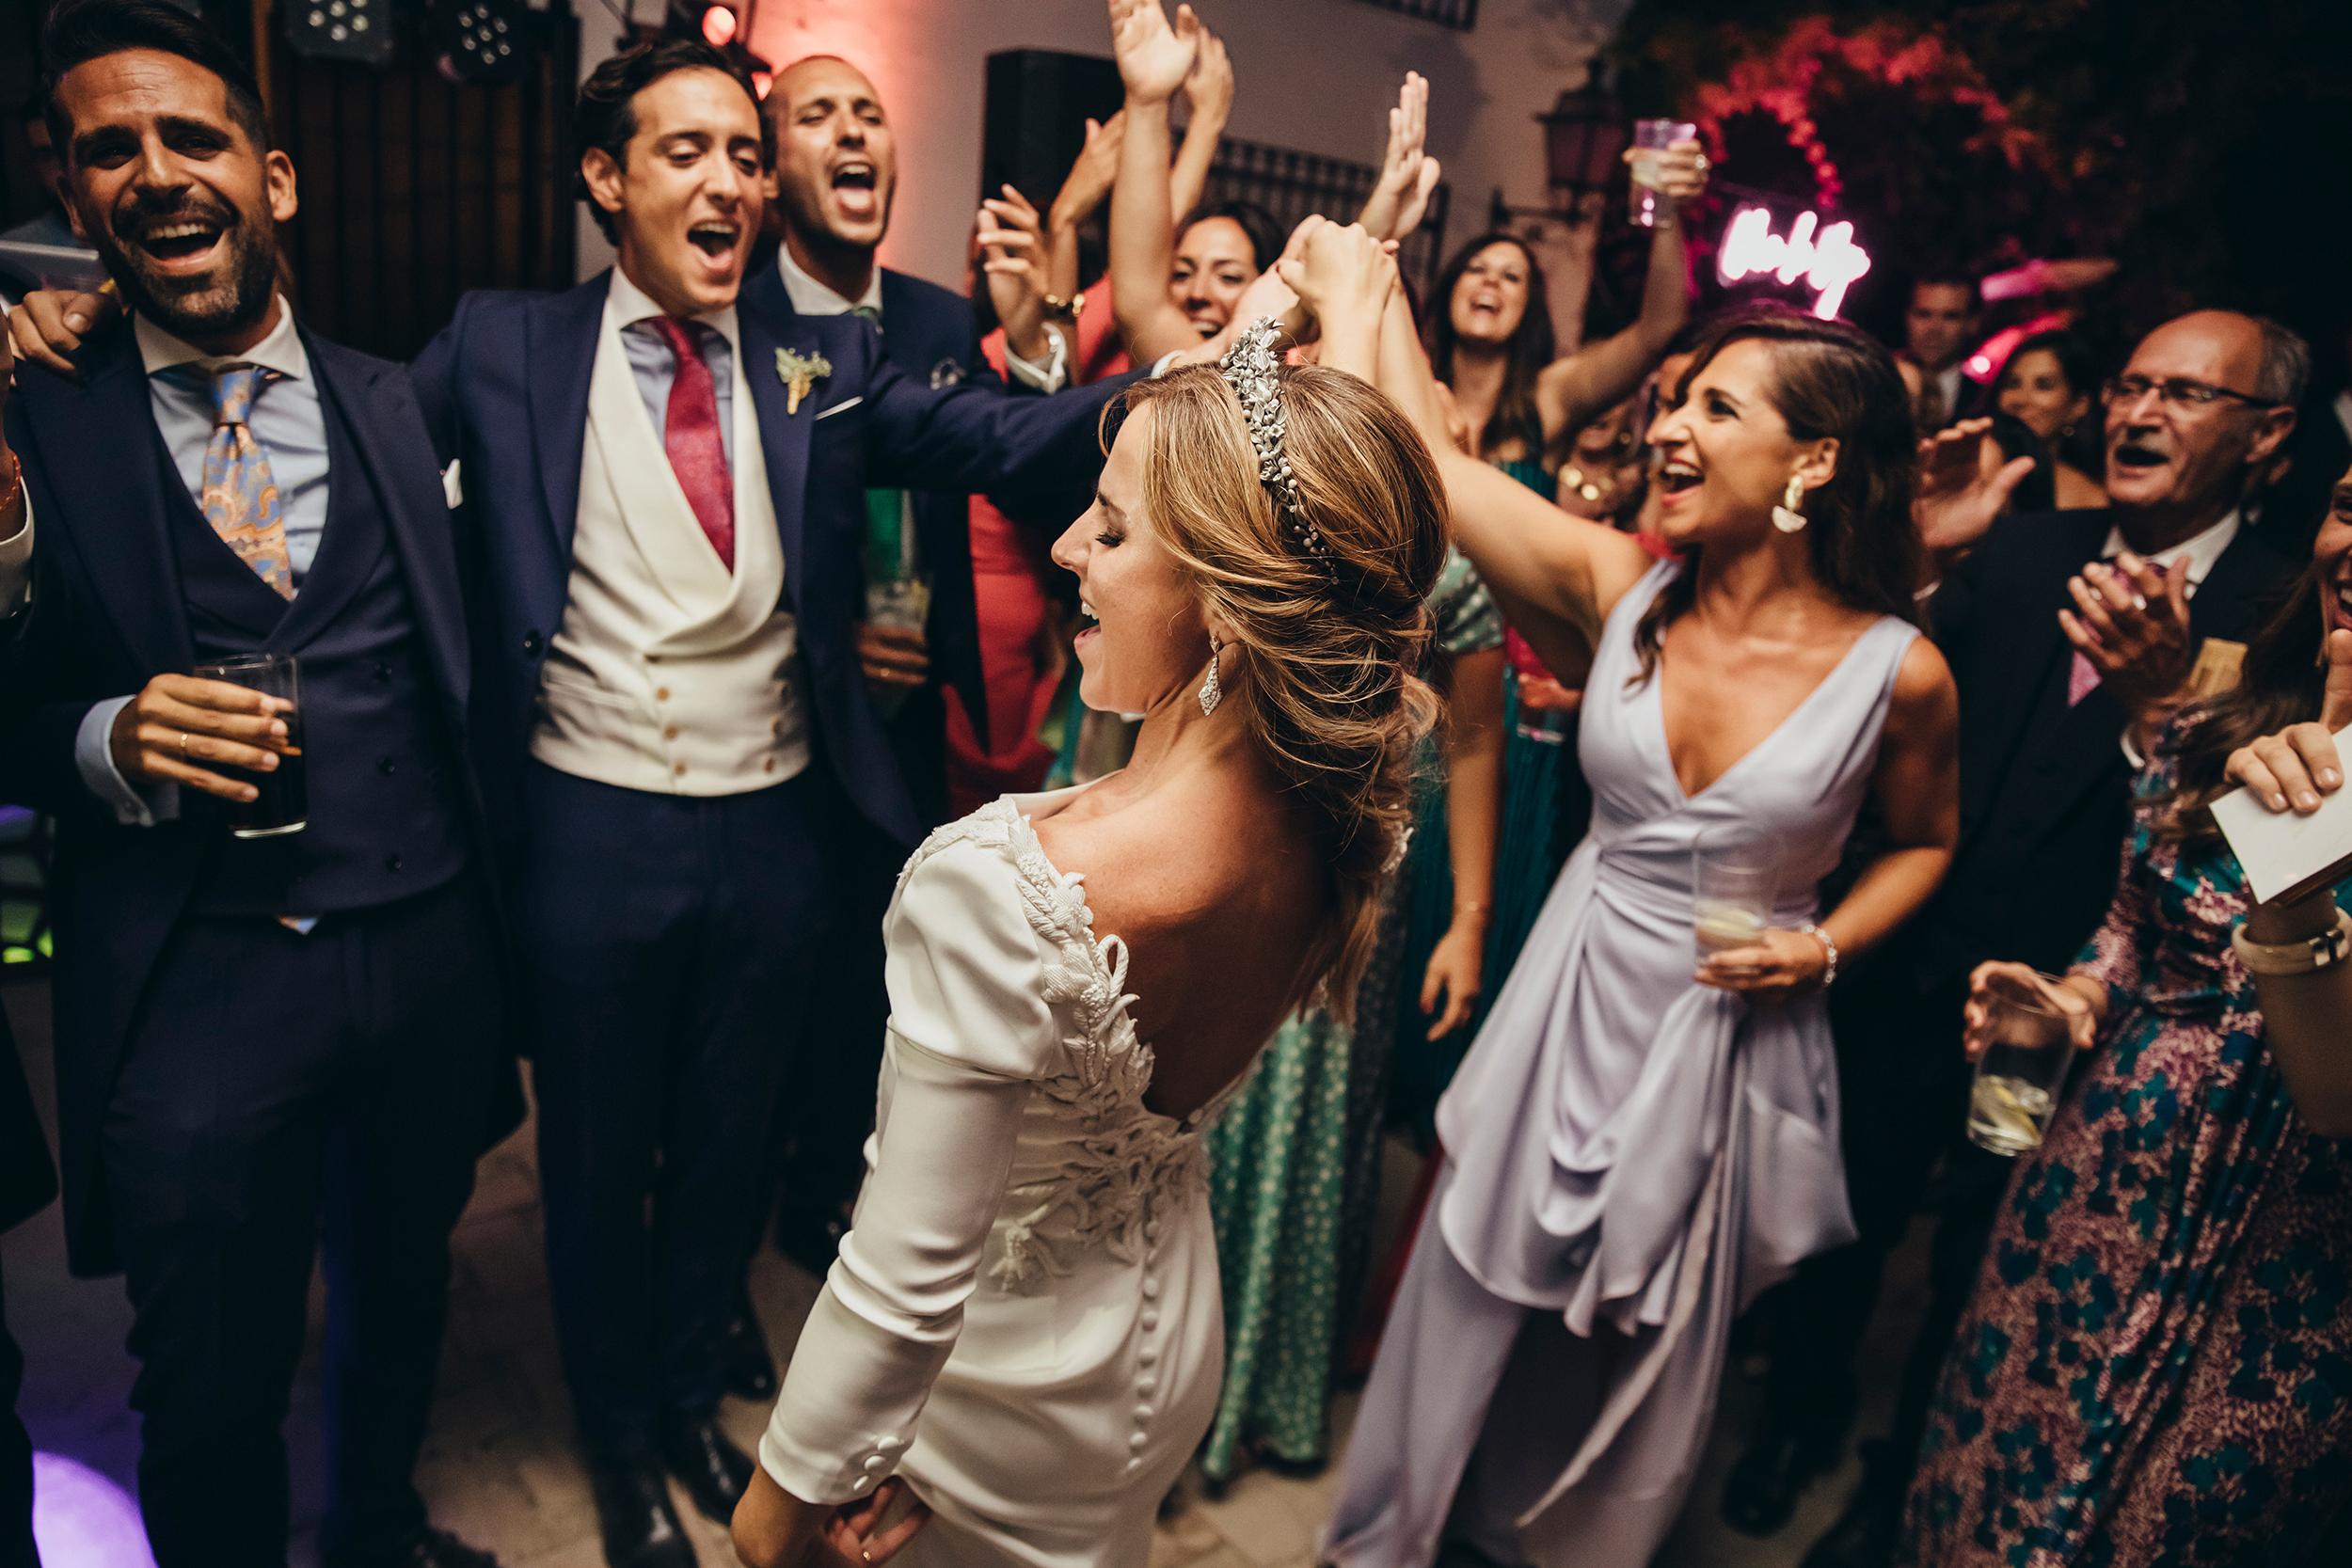 fotografo-bodas-granada-catedral-sagrario-jose-reyes_093.jpg